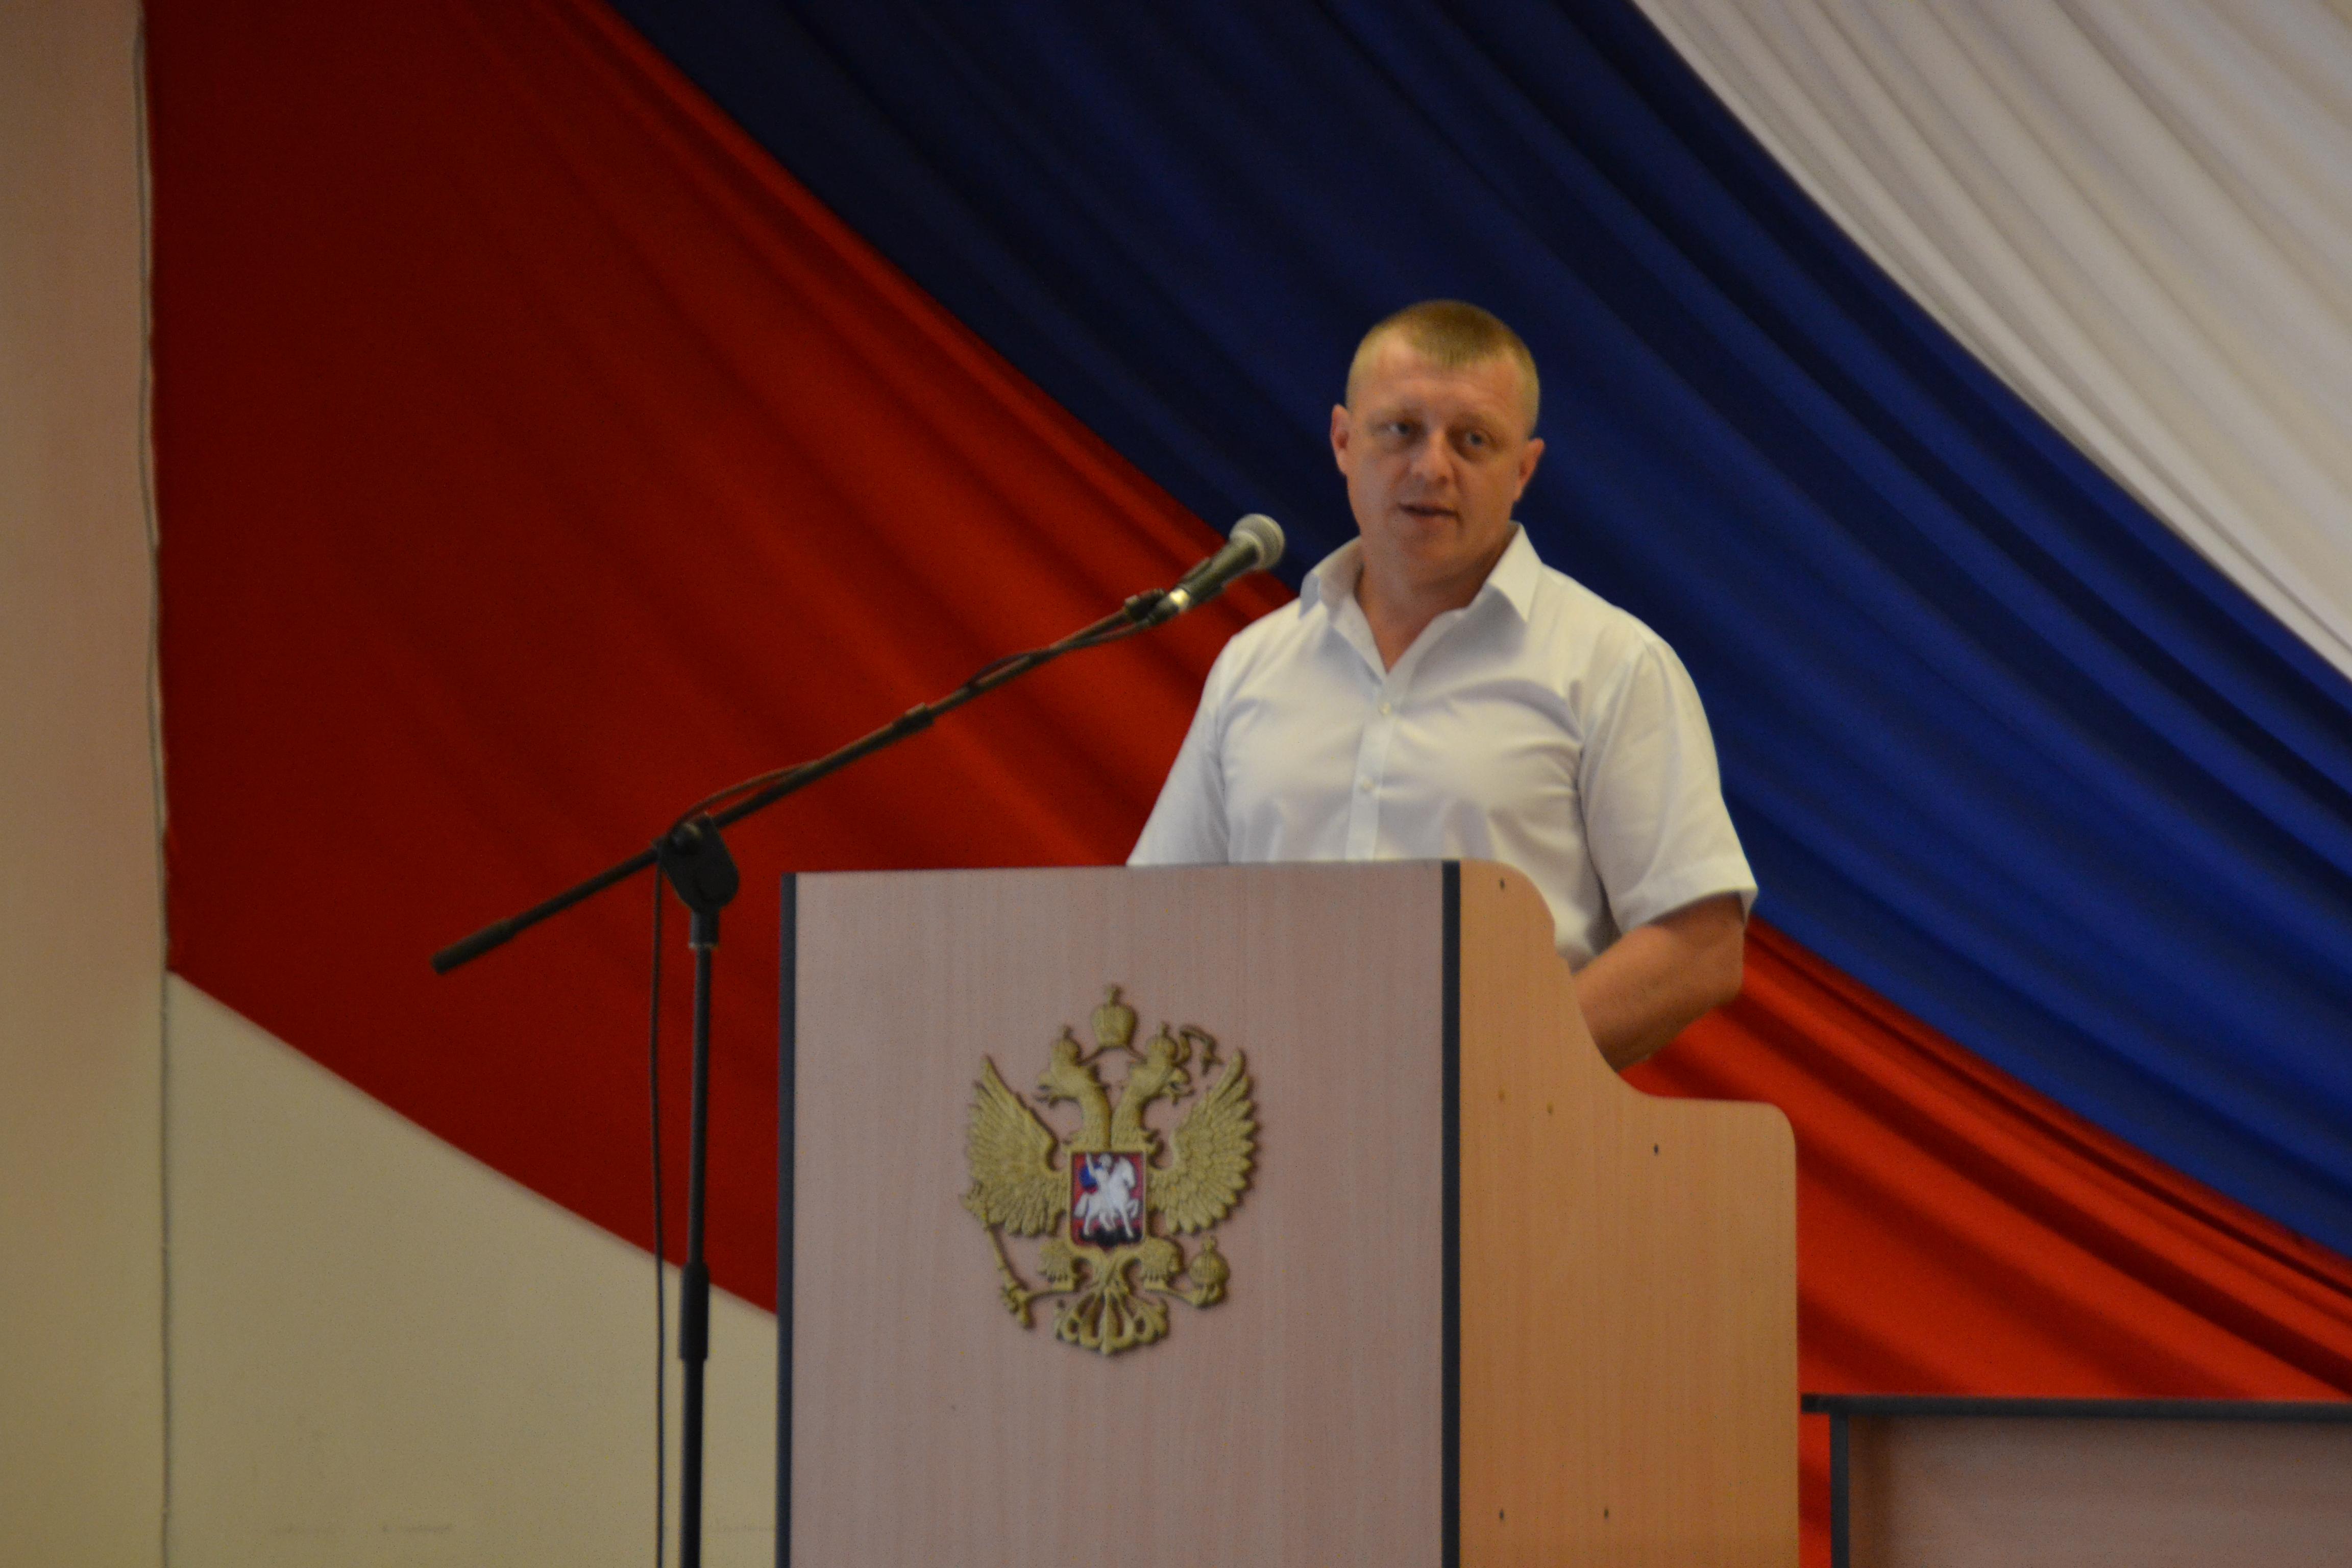 Новым мэром Туапсе стал Сергей Бондаренко